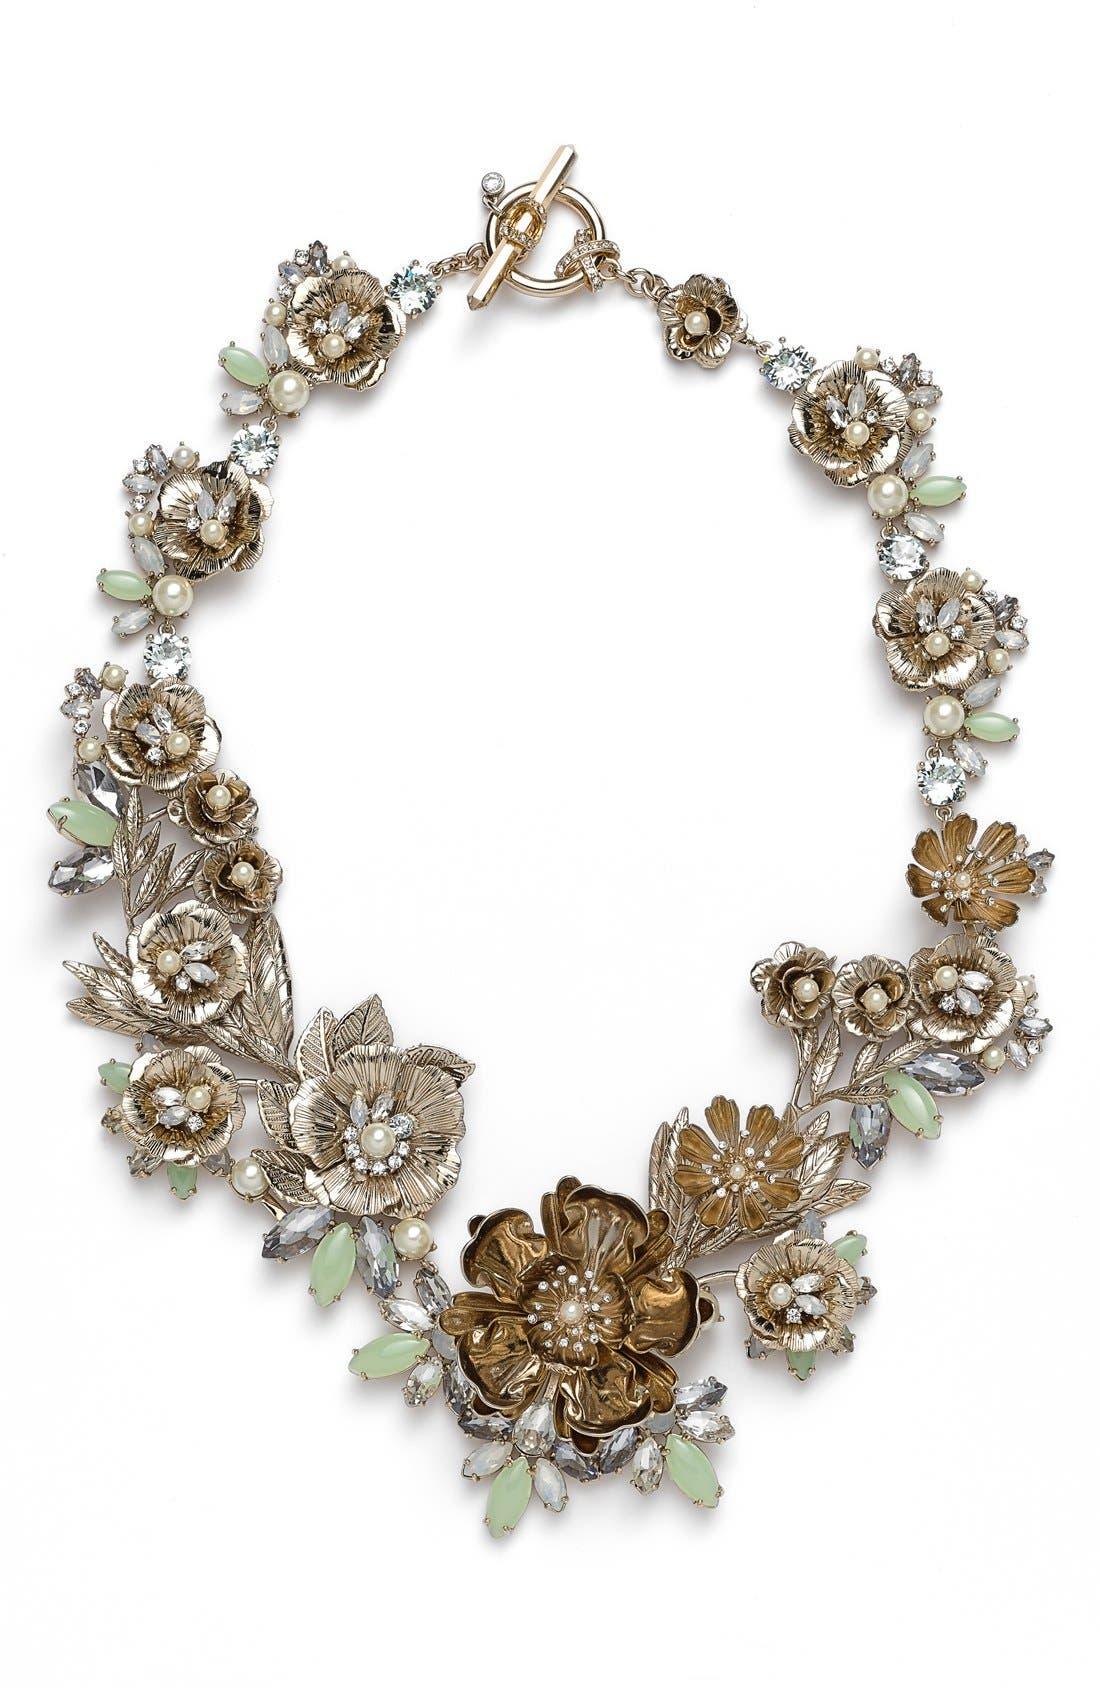 Alternate Image 1 Selected - Marchesa 'Drama' Crystal Floral Collar Neckace